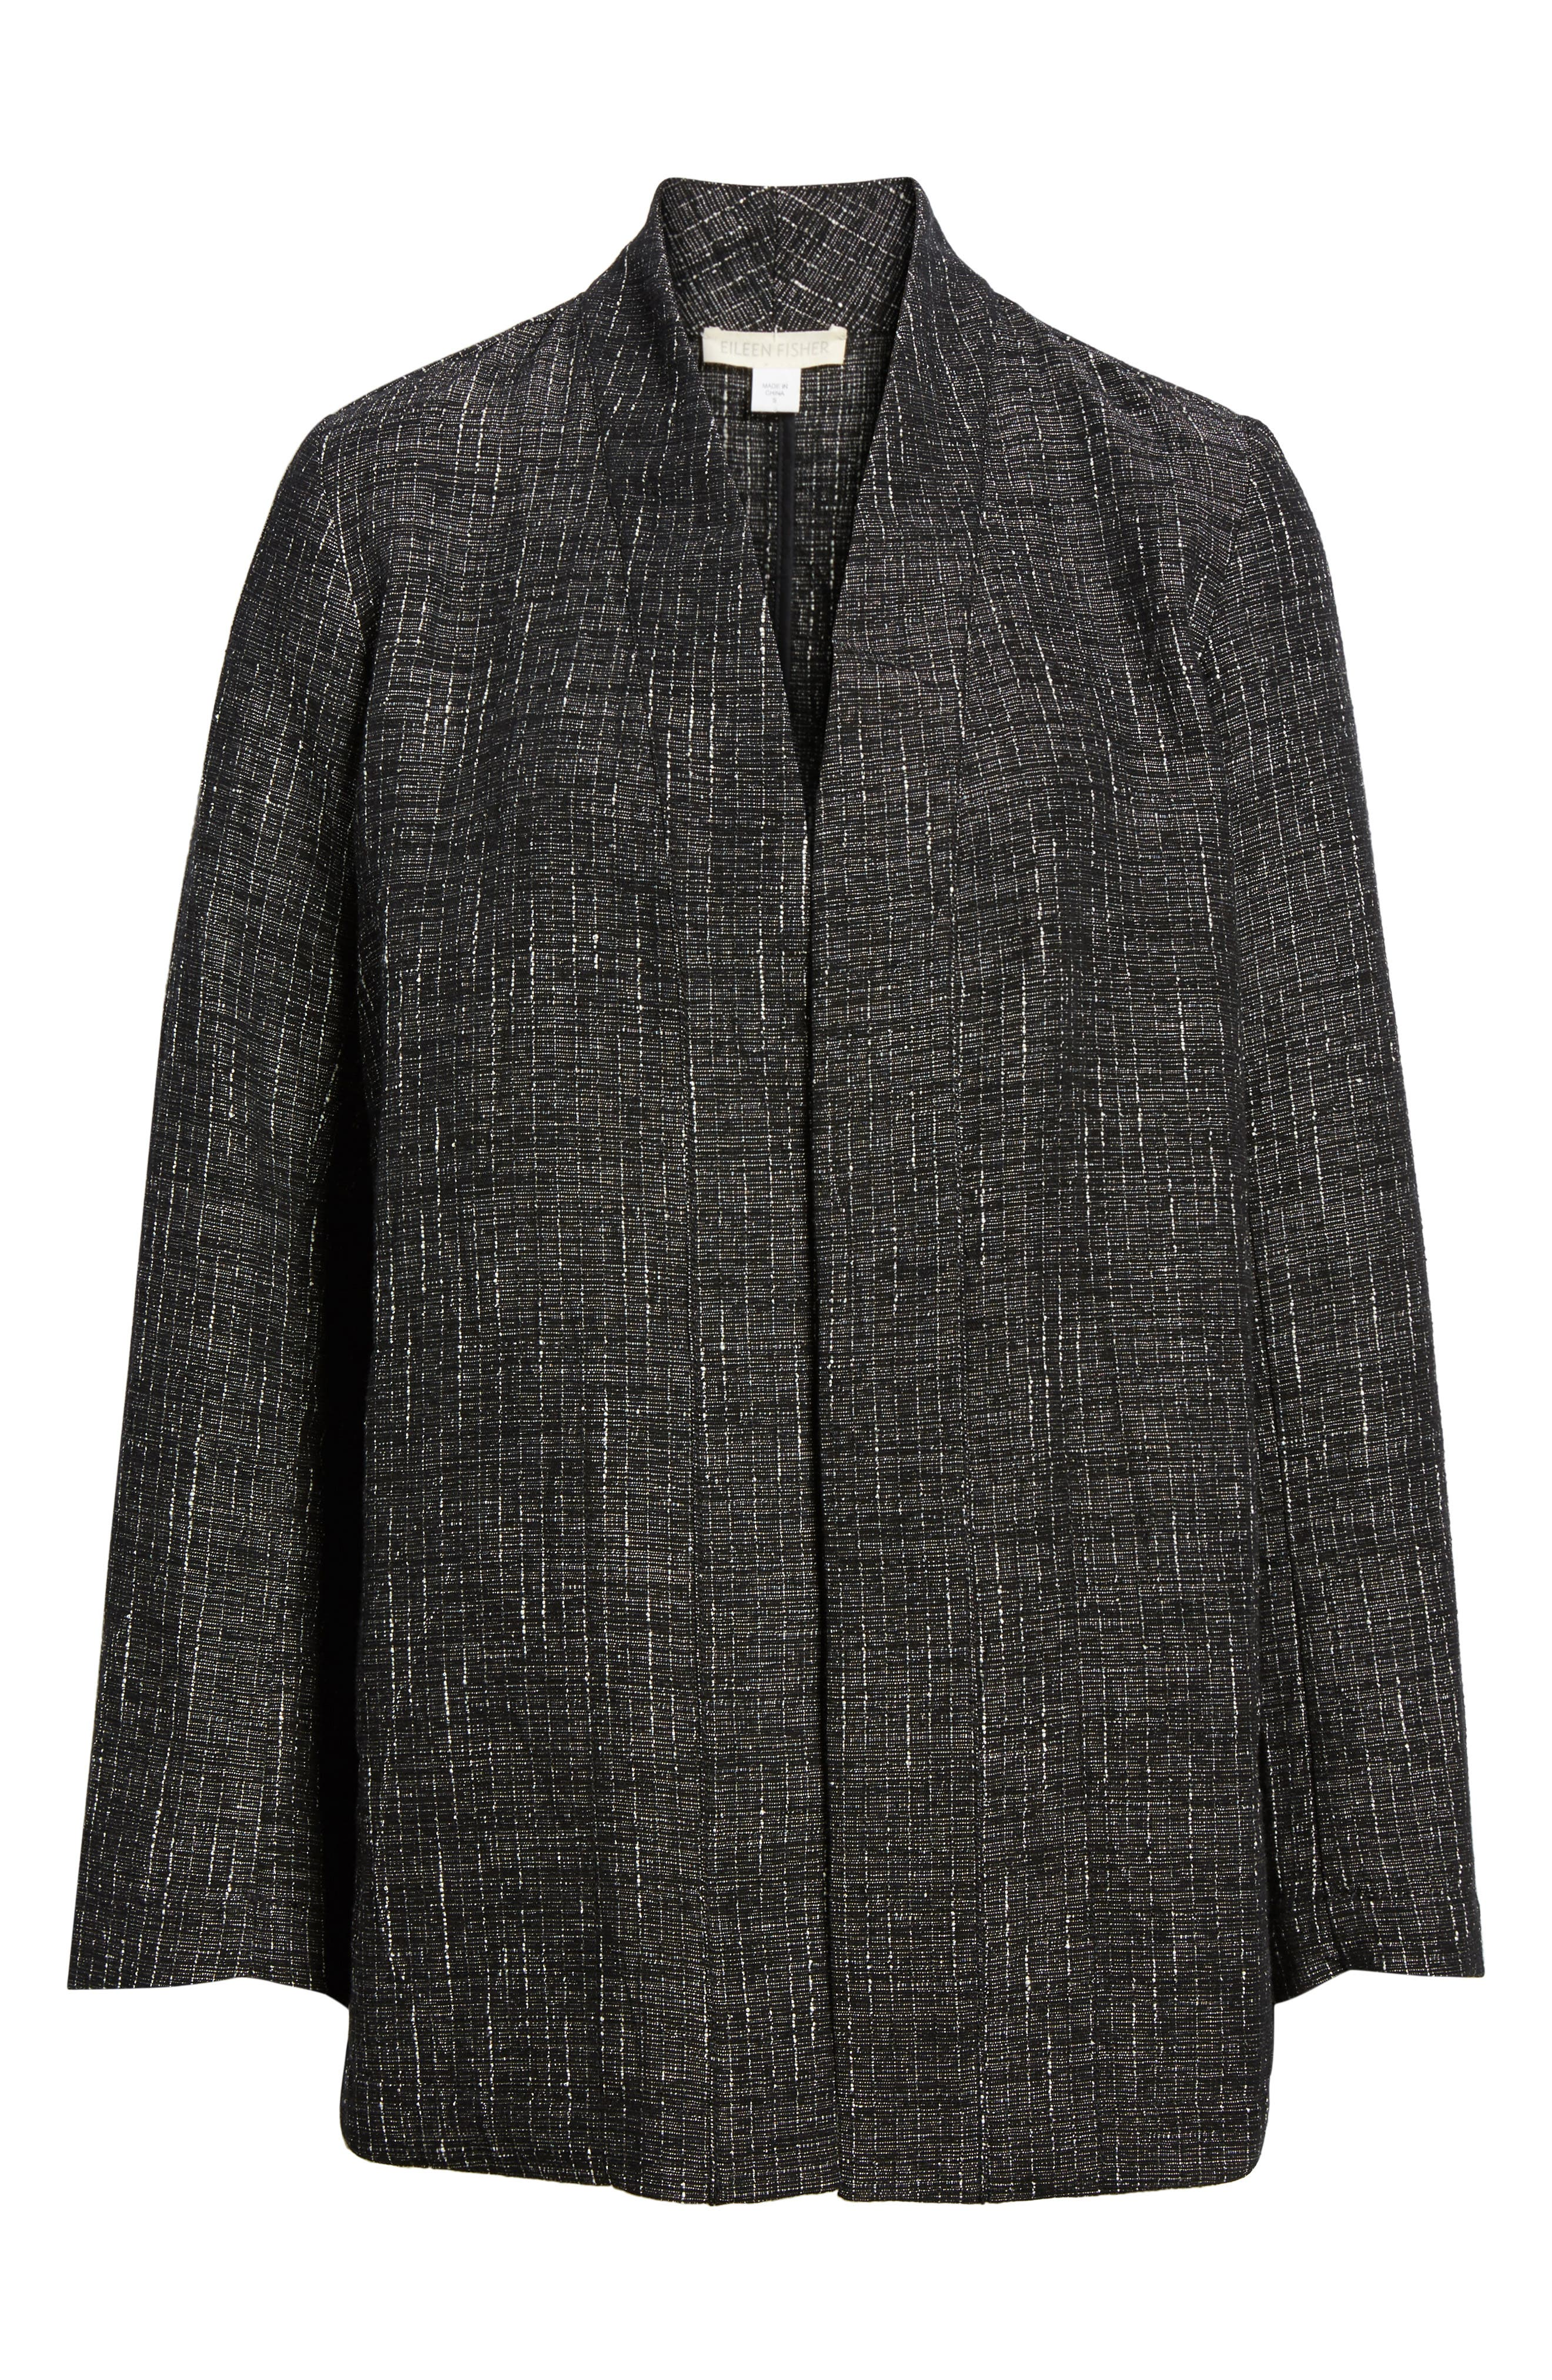 Stand Collar Kimono Jacket,                             Alternate thumbnail 5, color,                             001